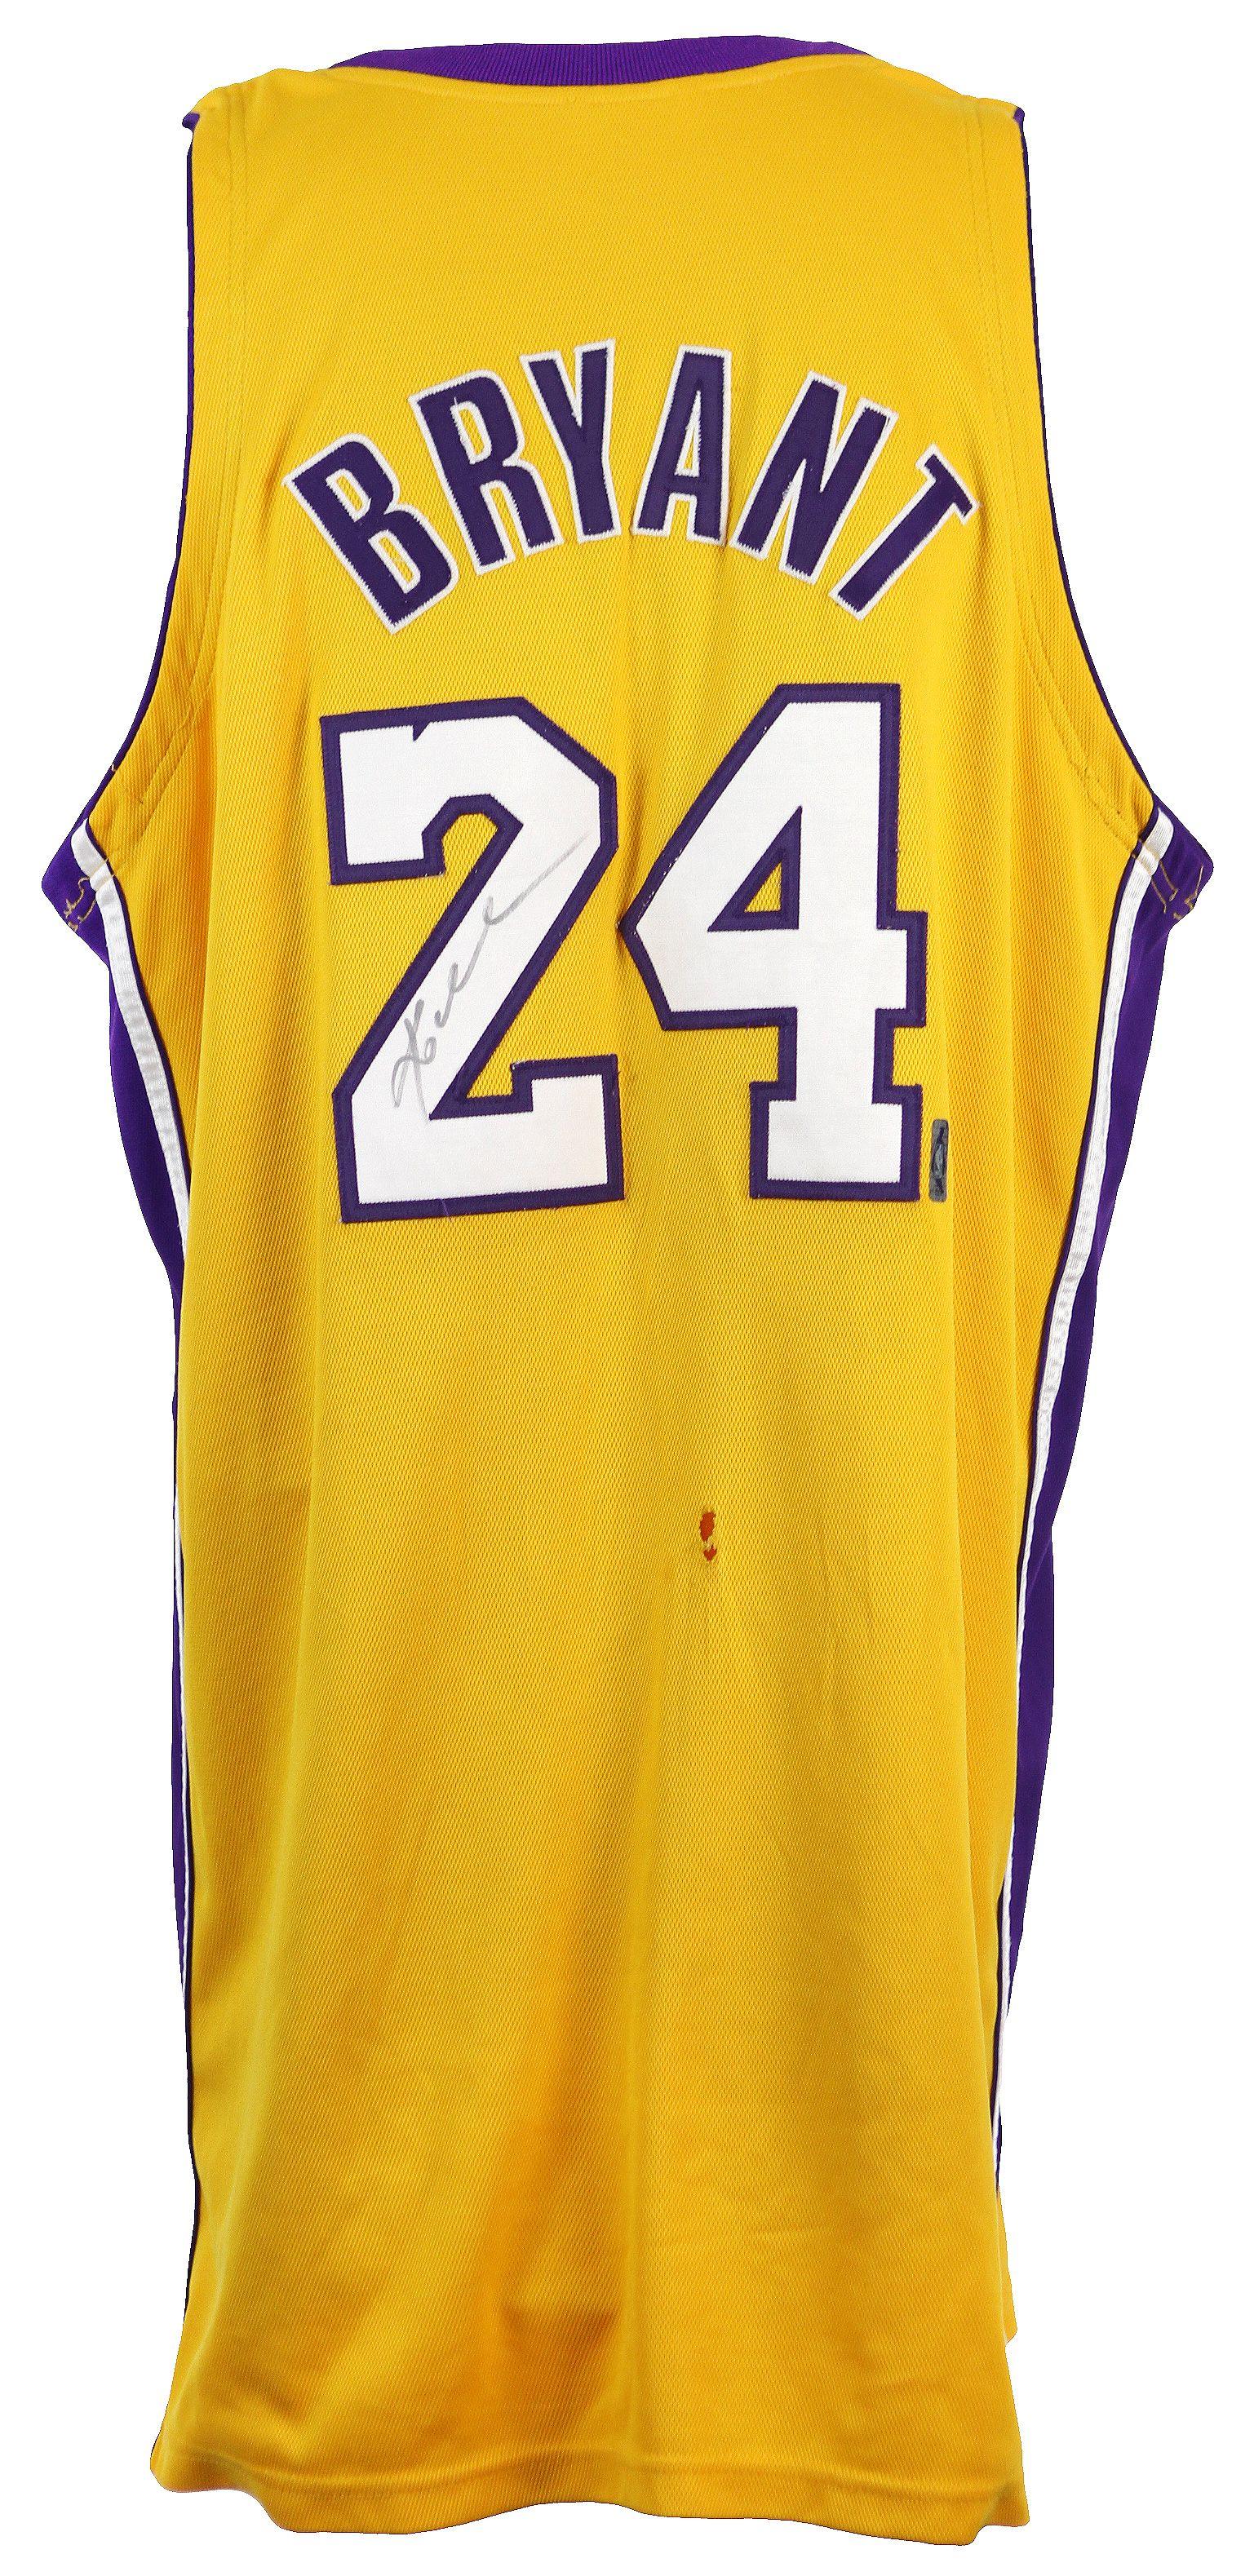 b8dddf3edc7 Lot Detail - 2007-08 Kobe Bryant Los Angeles Lakers Signed Game Worn ...